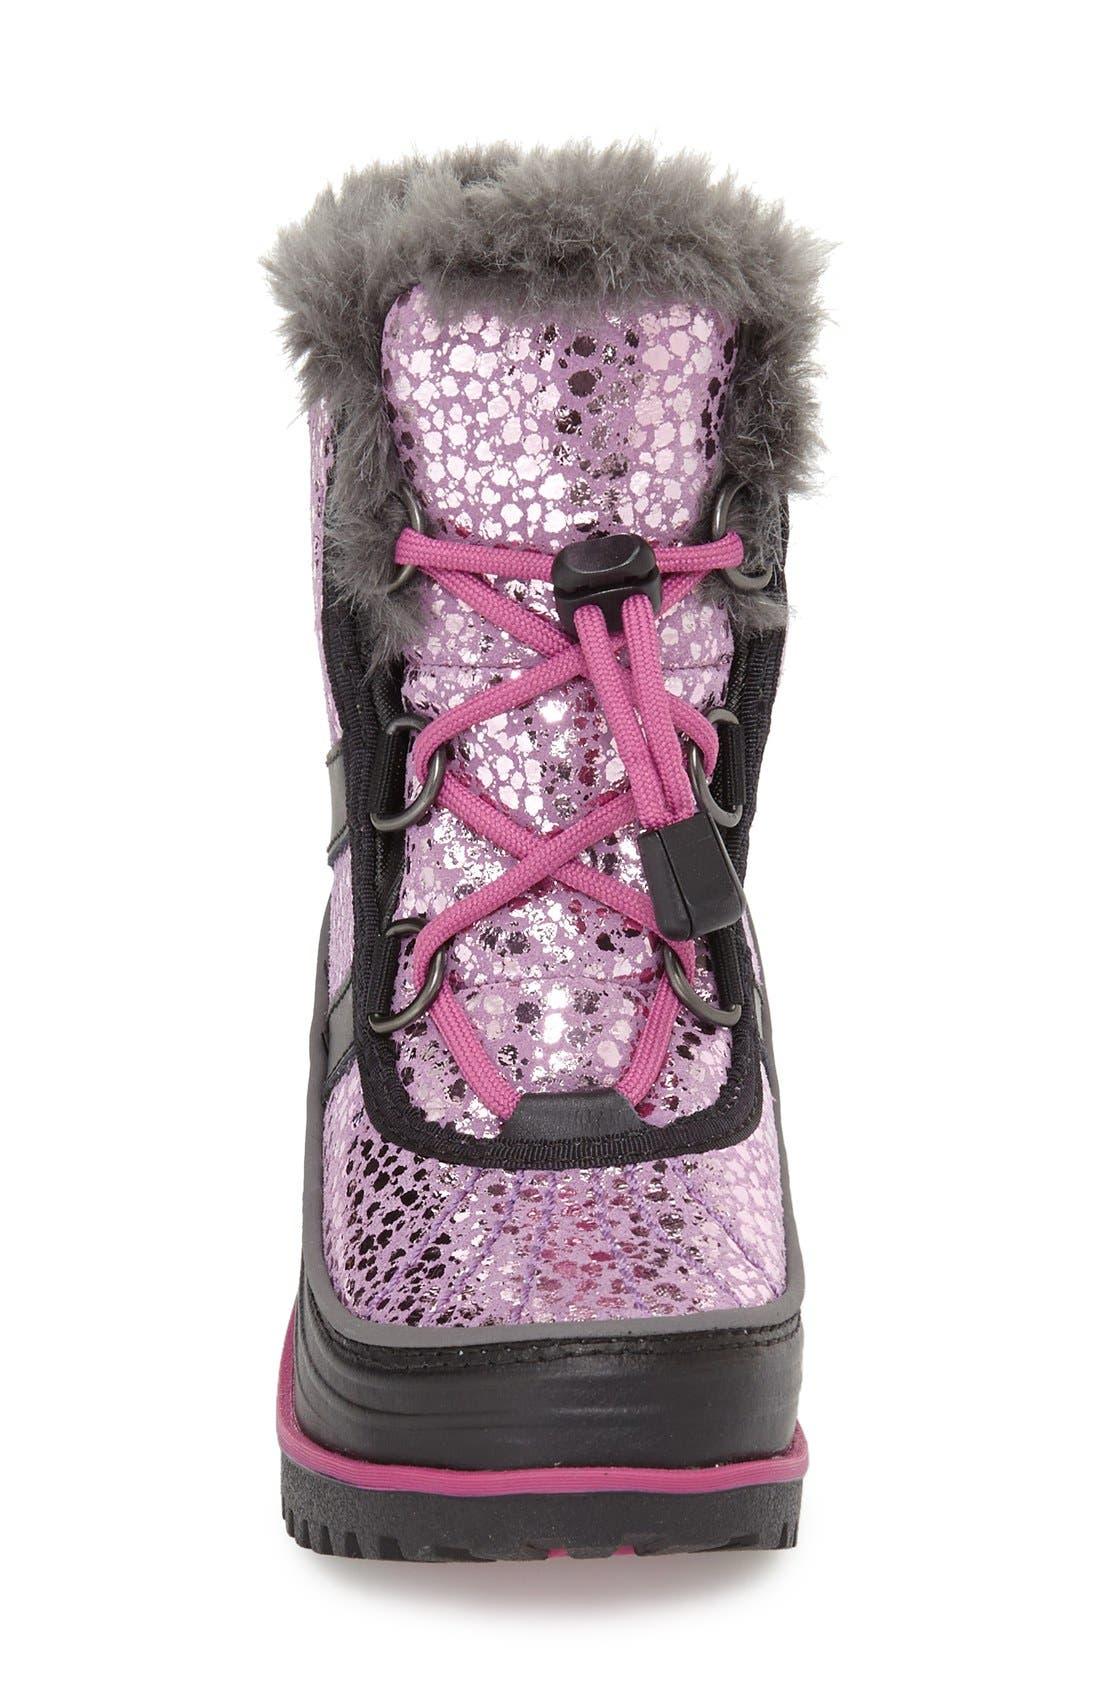 Alternate Image 3  - SOREL 'Tivoli II' Waterproof Snow Boot (Toddler & Little Kid)